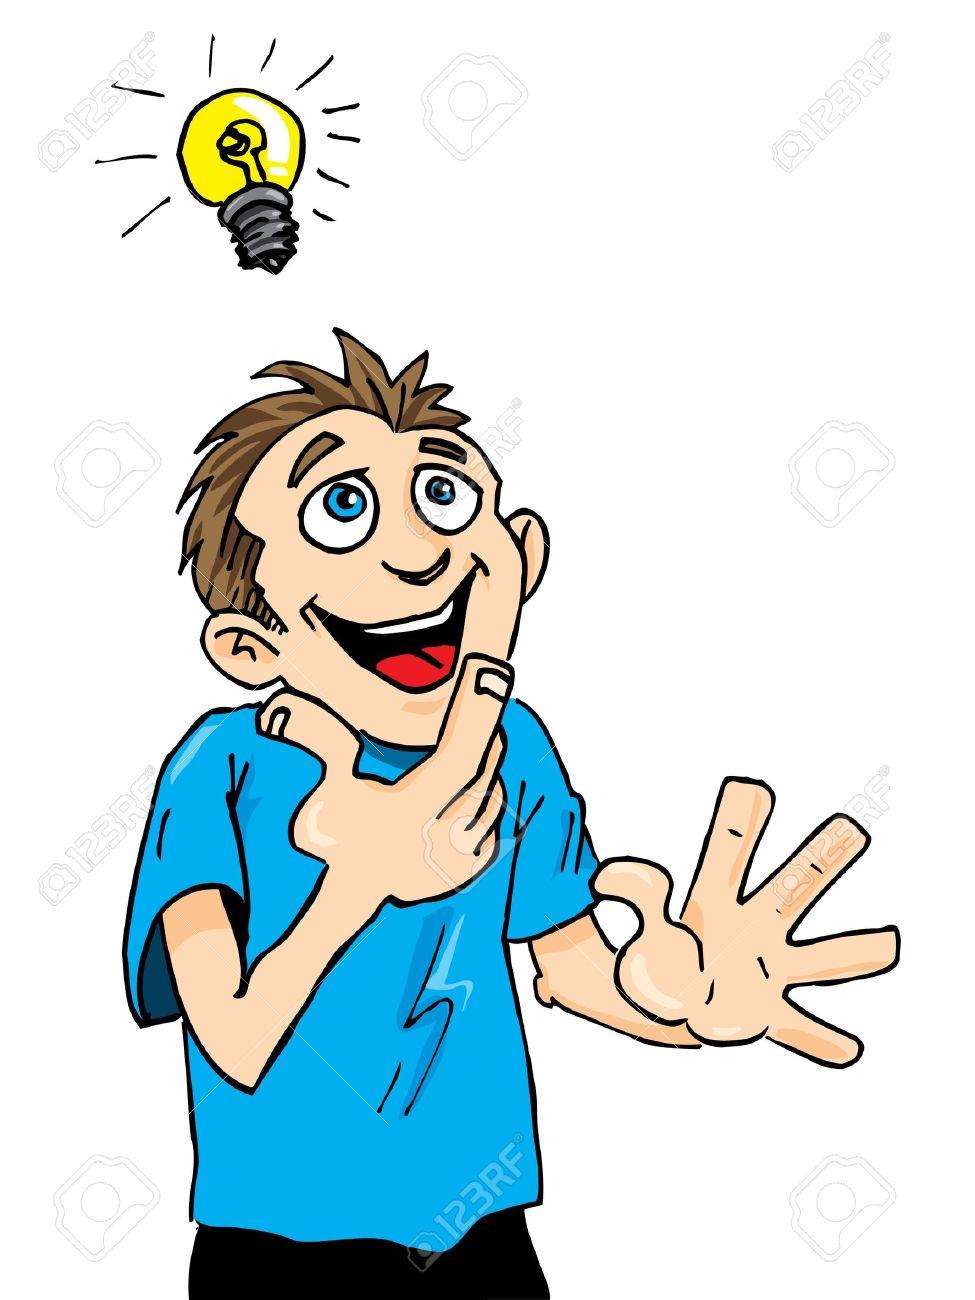 Cartoon man gets a bright idea. A light bulb above his head.